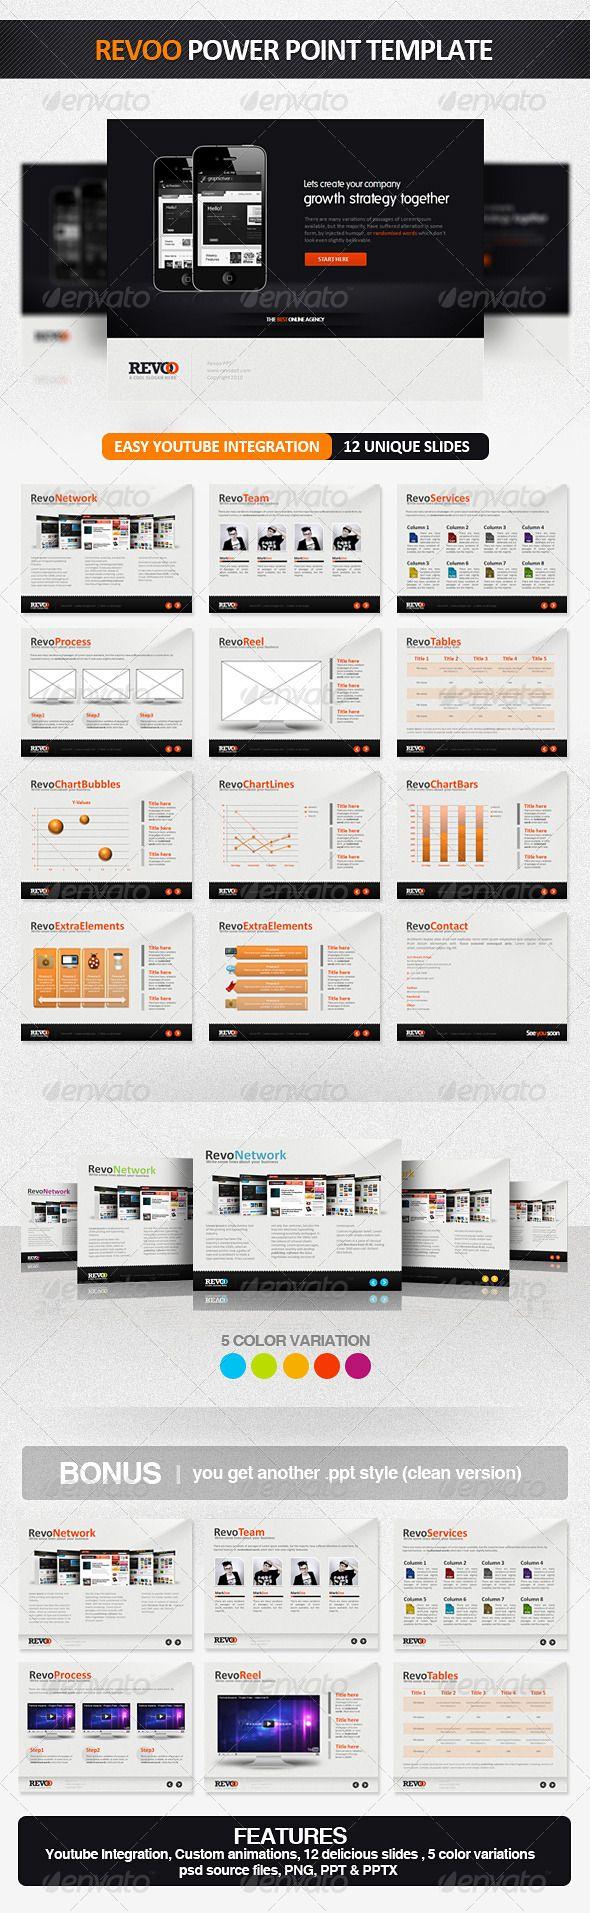 Presentation Templates - Revoo PowerPoint Presentation Template   GraphicRiver